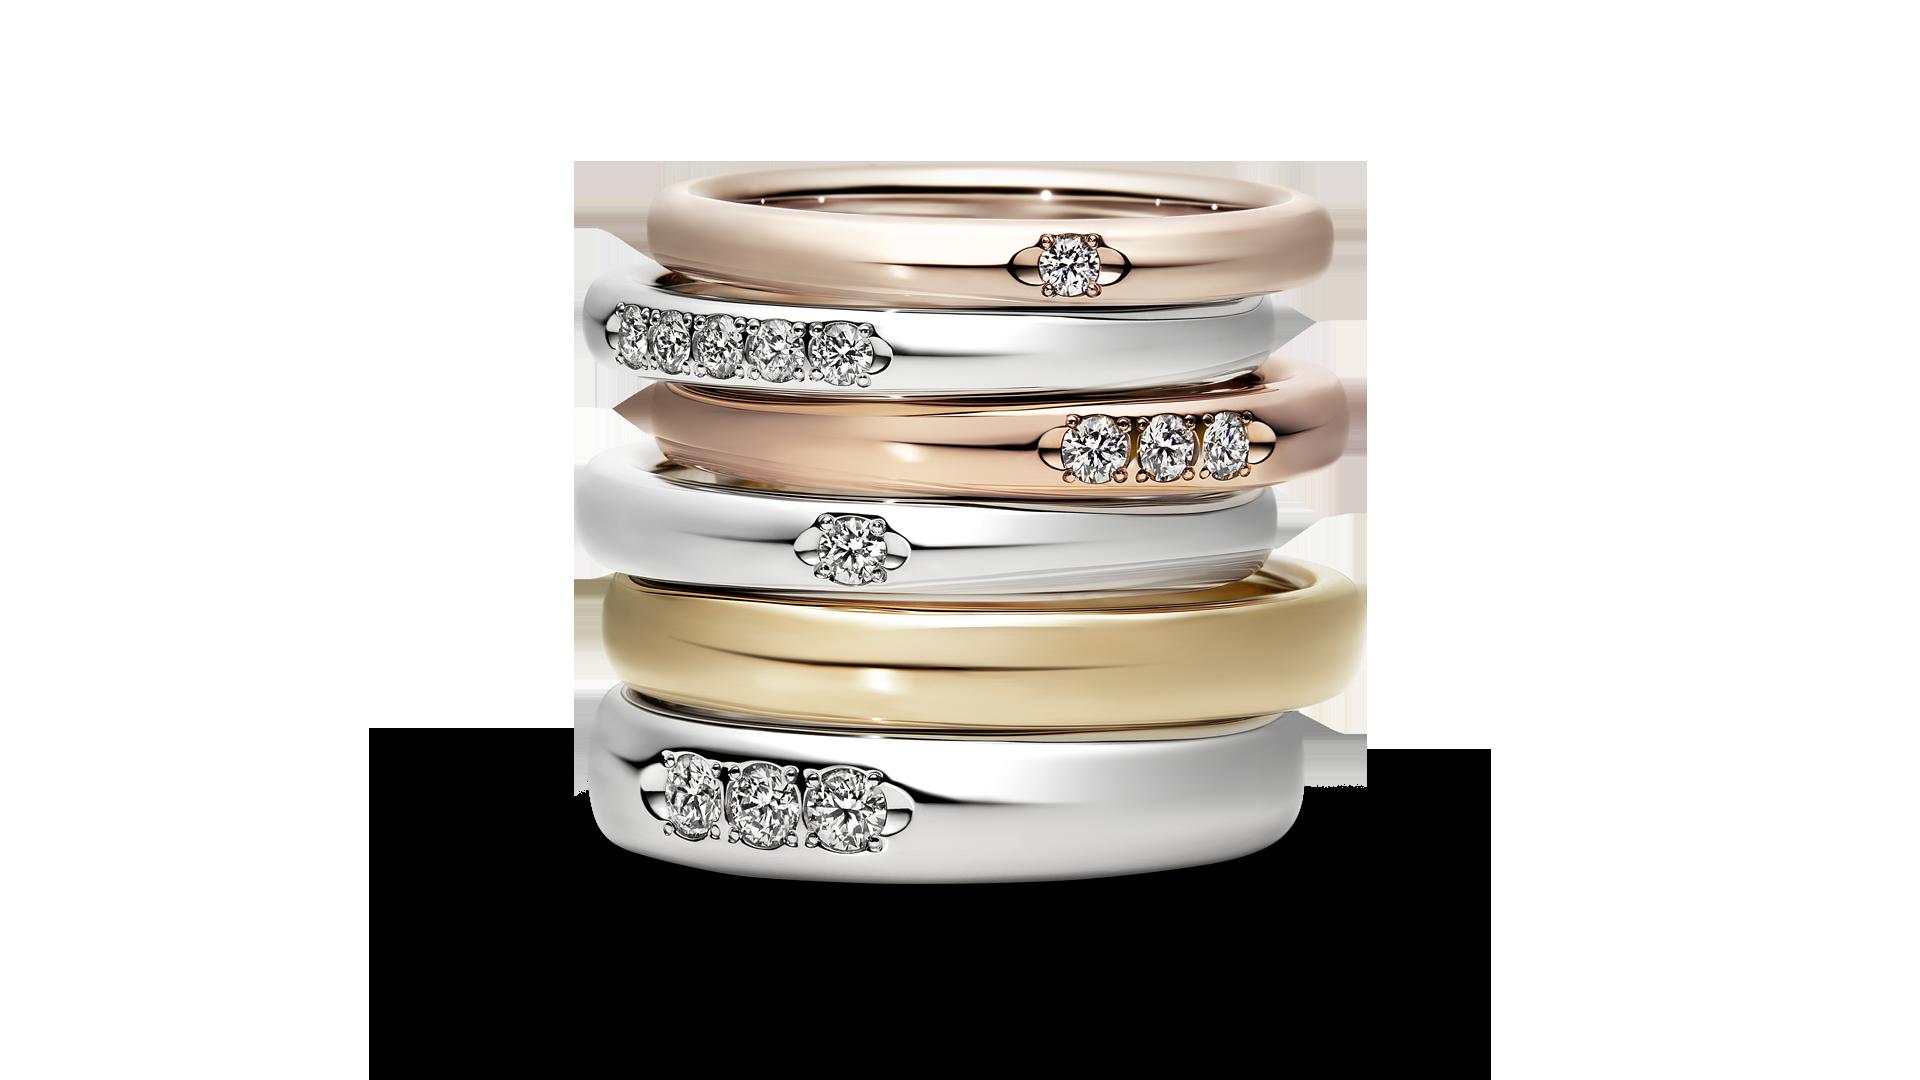 Origin Belief04 オリジンビリーフ04 | 結婚指輪サムネイル 3